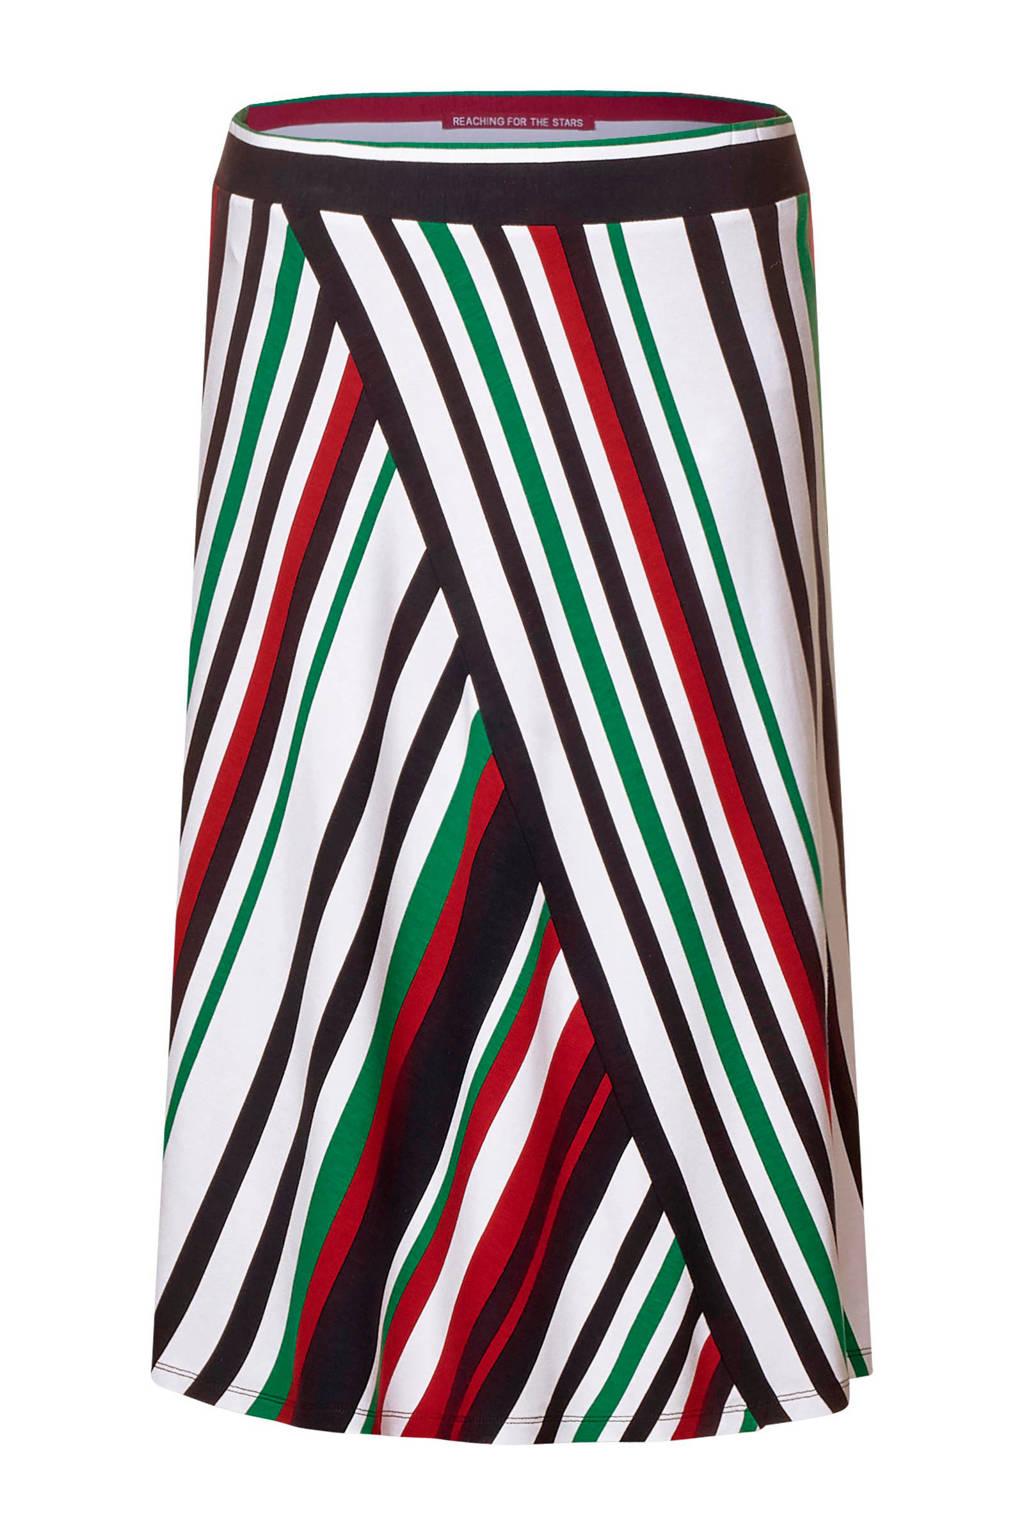 Street One gestreepte rok, Wit/donkerblauw/rood/groen